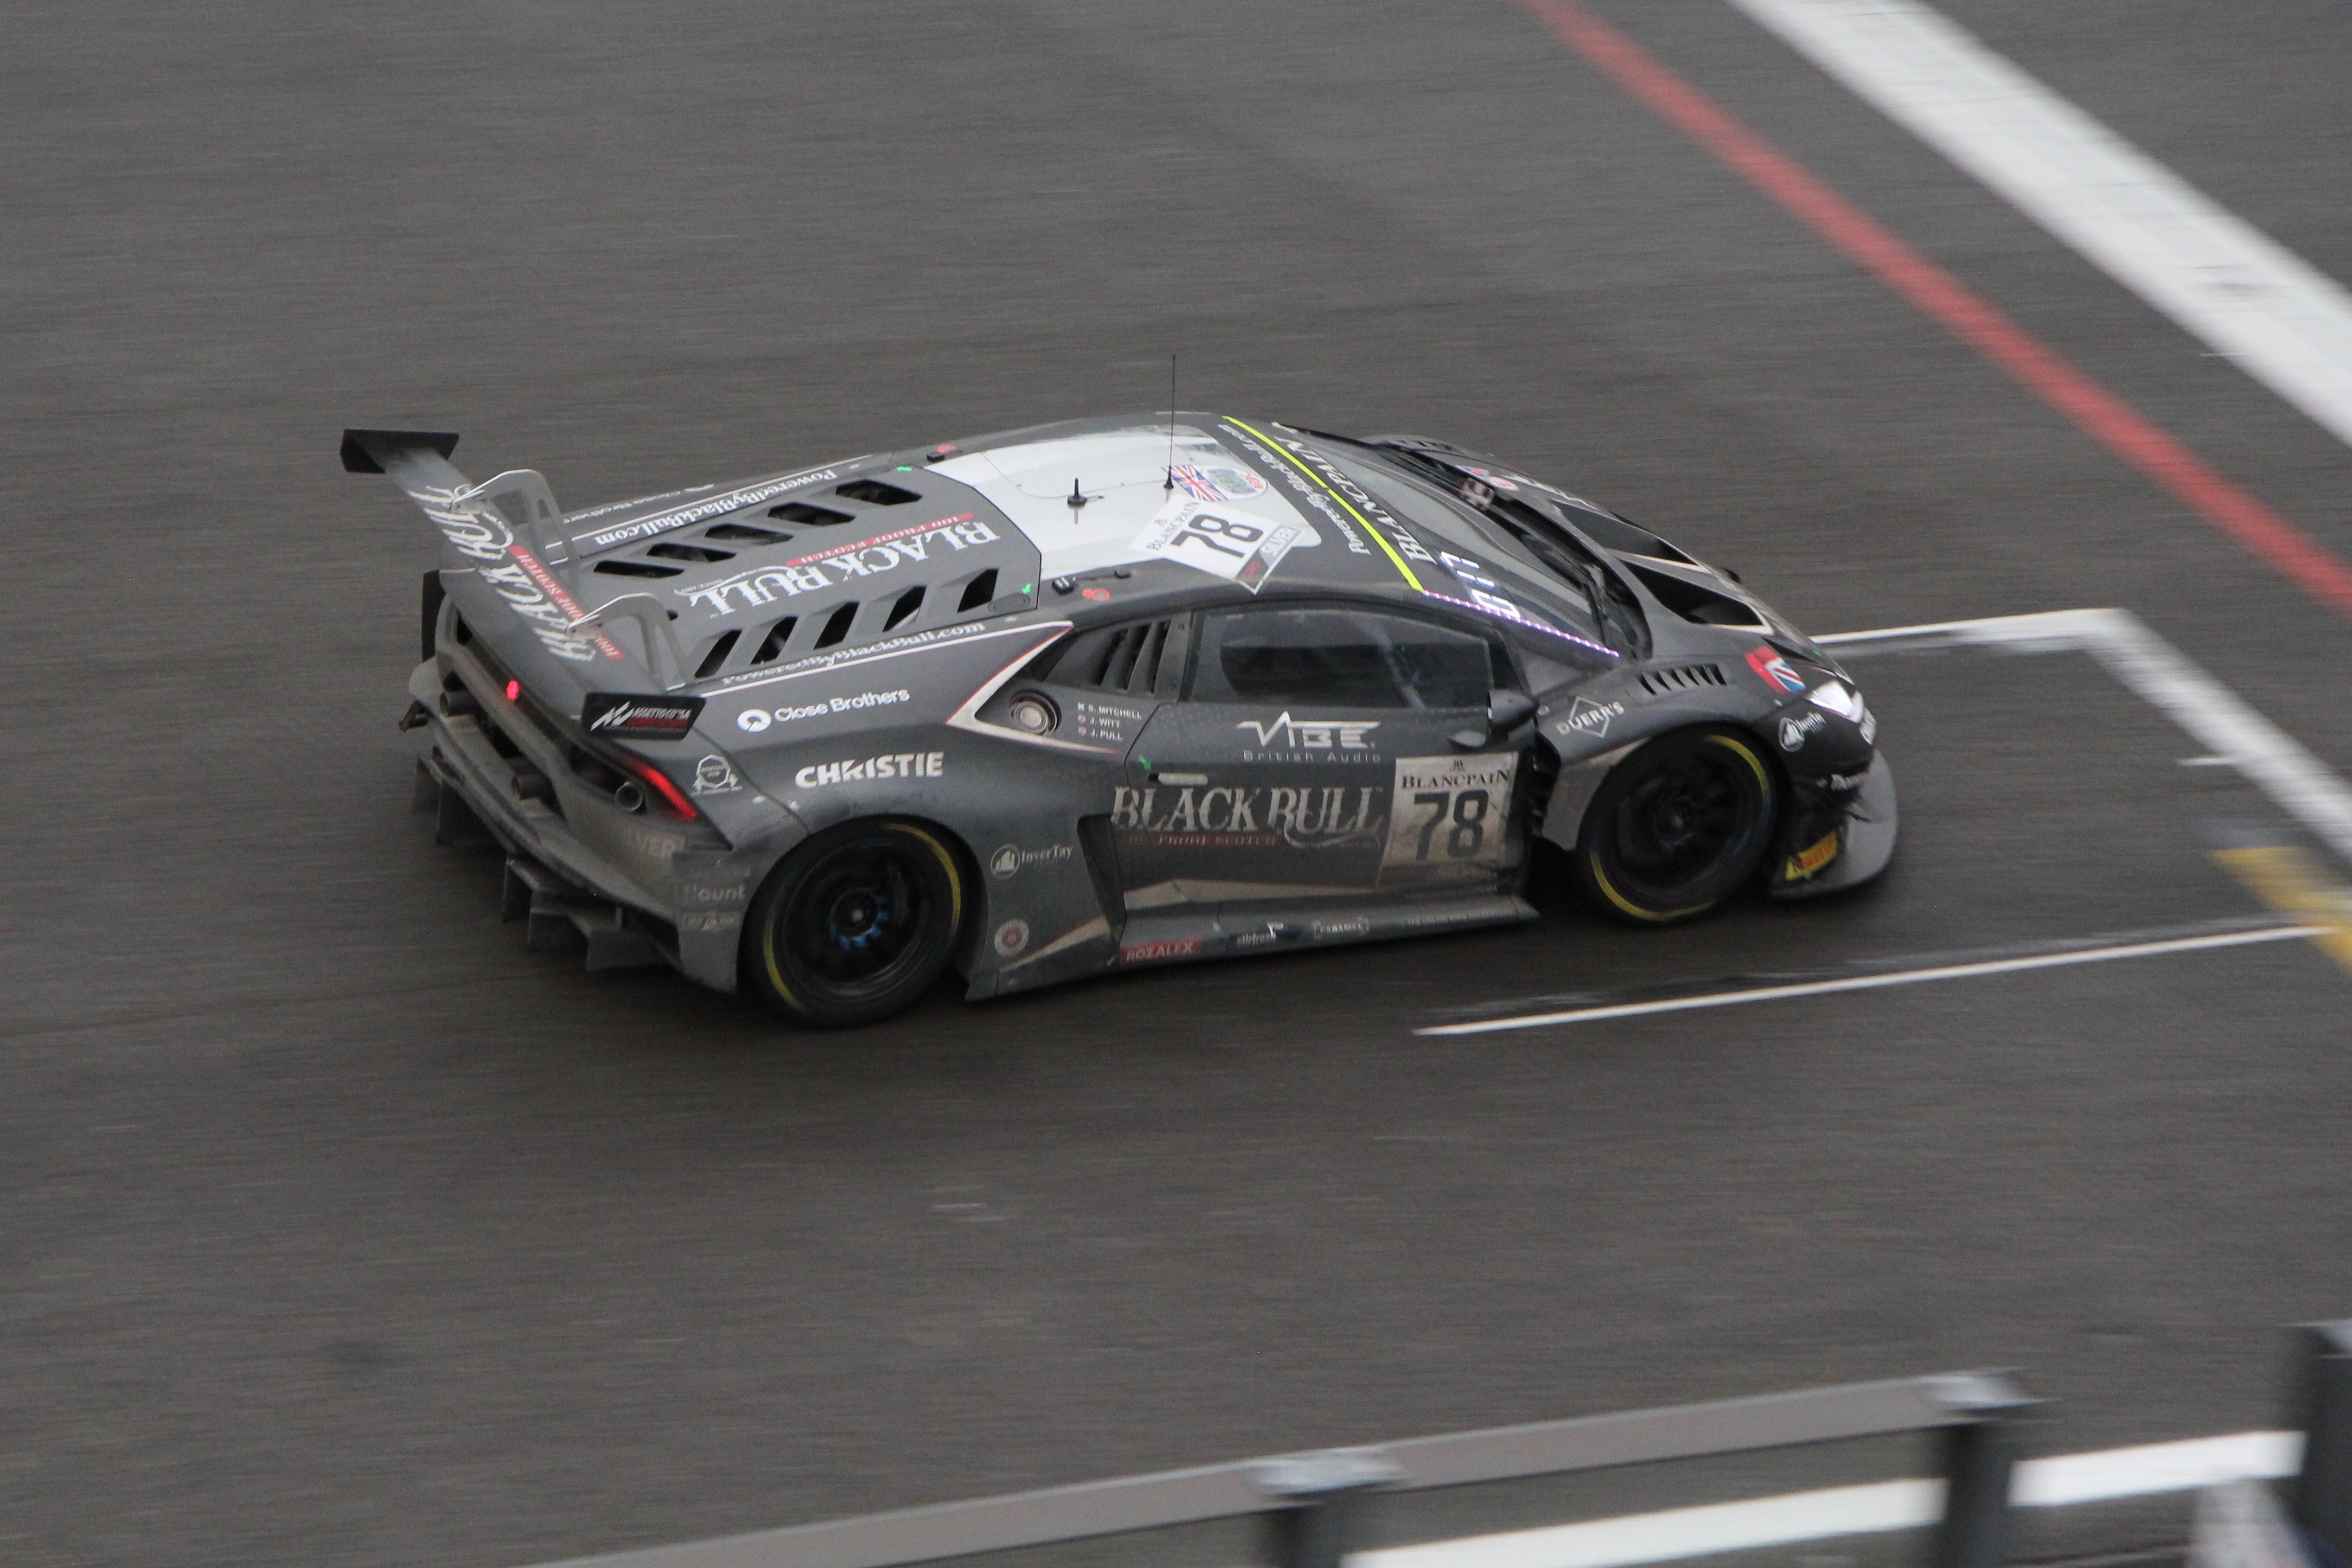 Lamborghini Huracan GT3 - n78 - Total 24 Heures de Spa 2019 - photo Ludo Ferrari